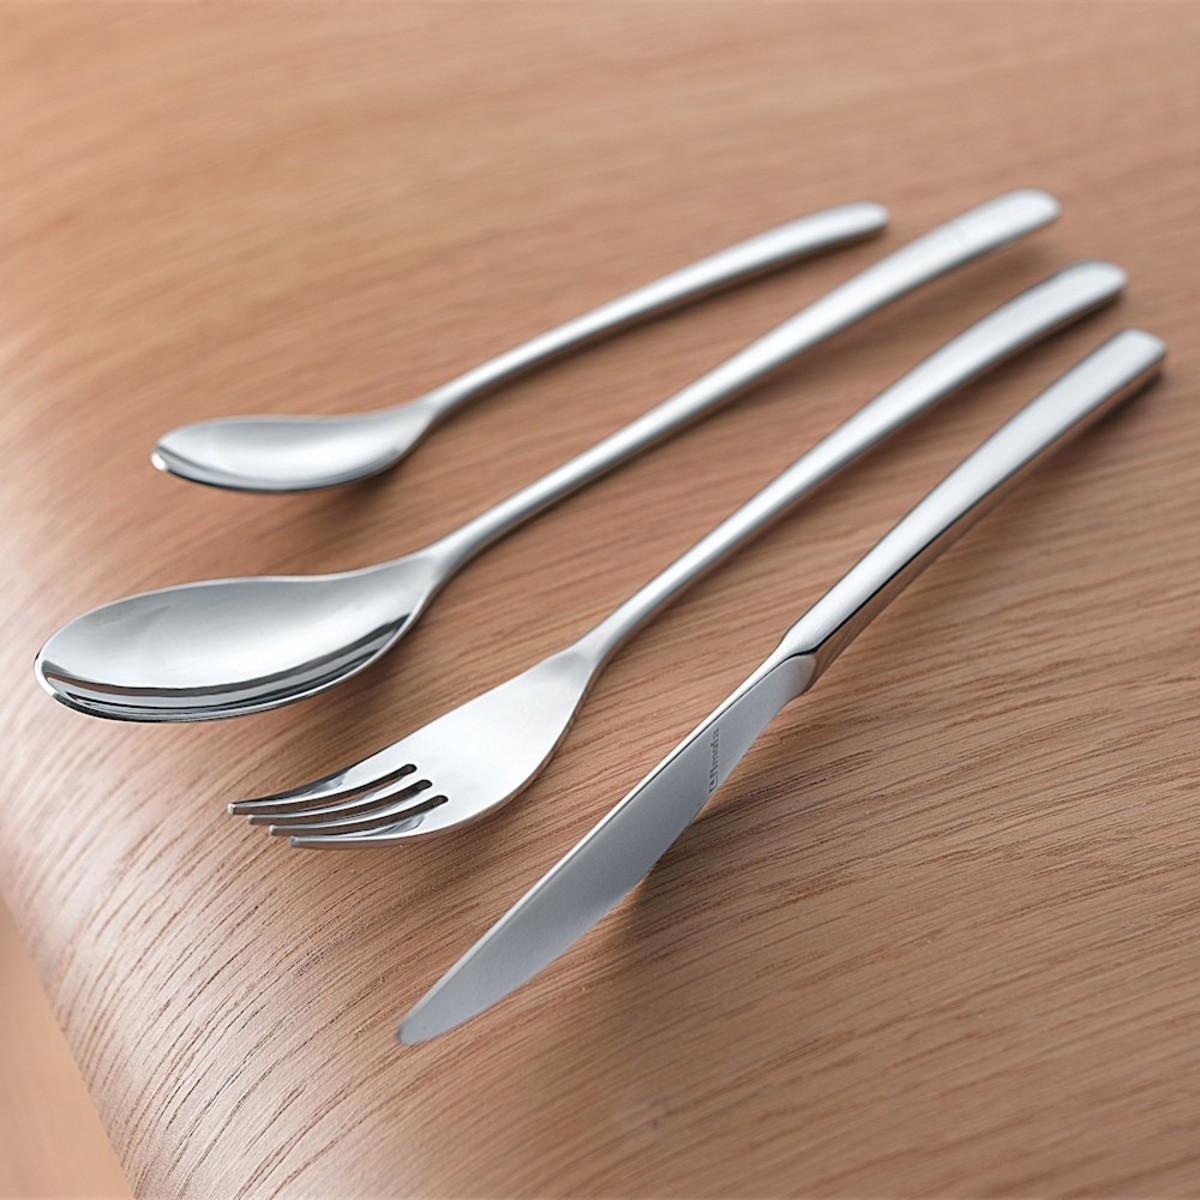 Juniper cutlery